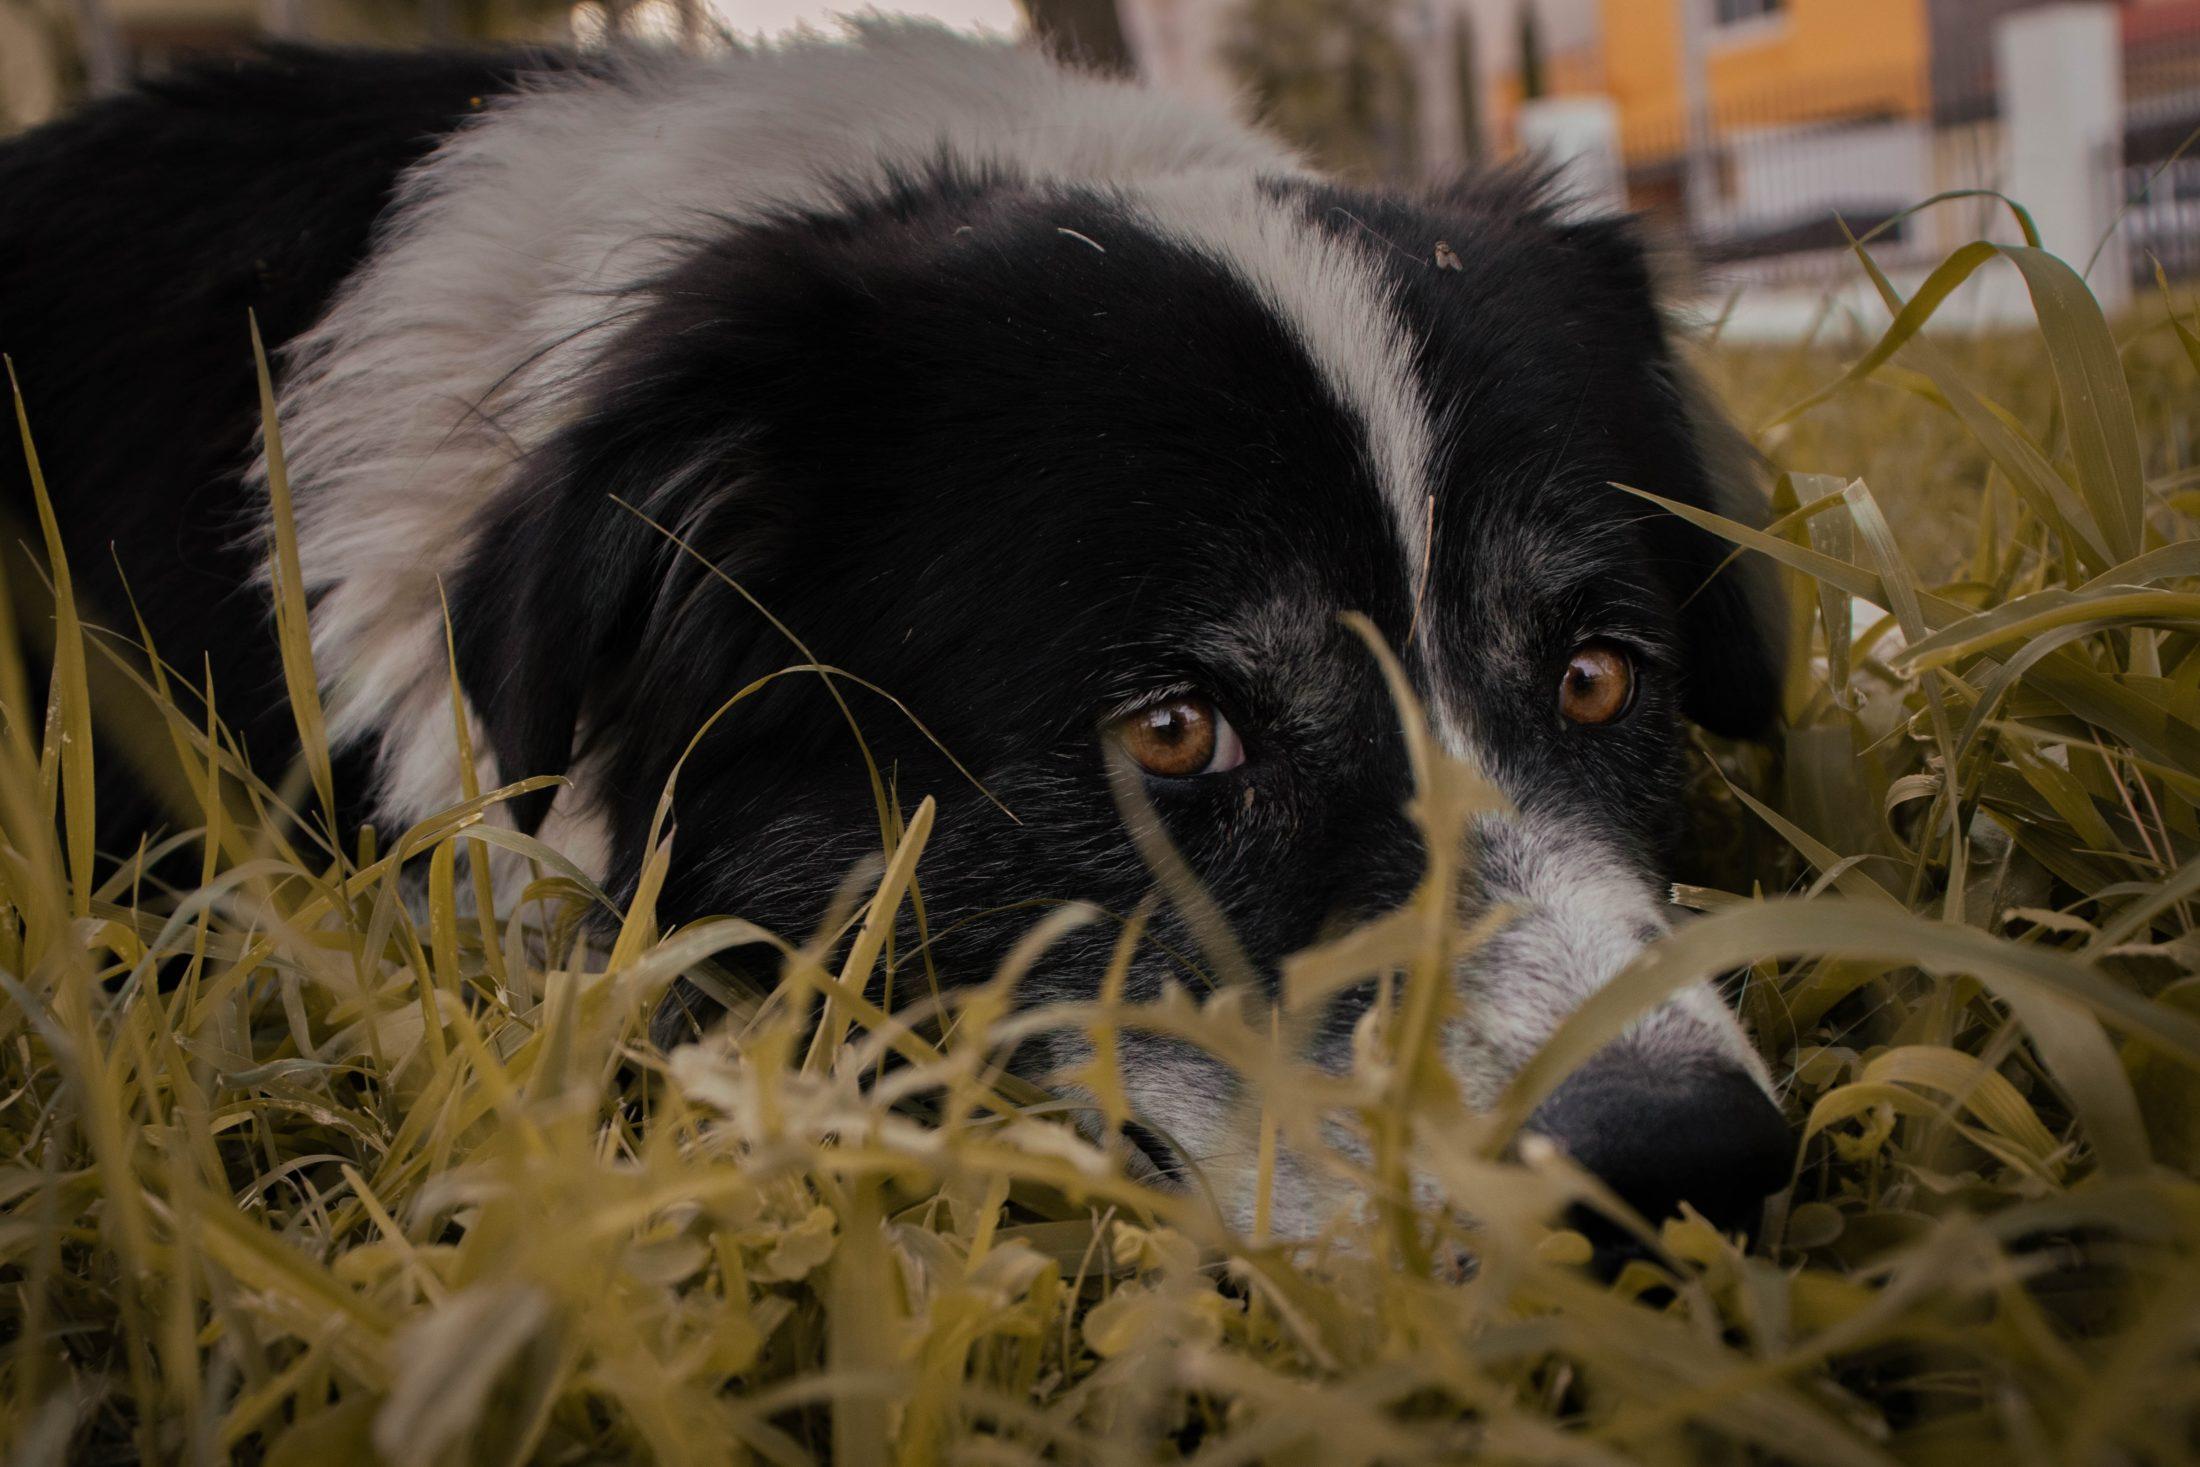 cachorro confuso deitado na grama